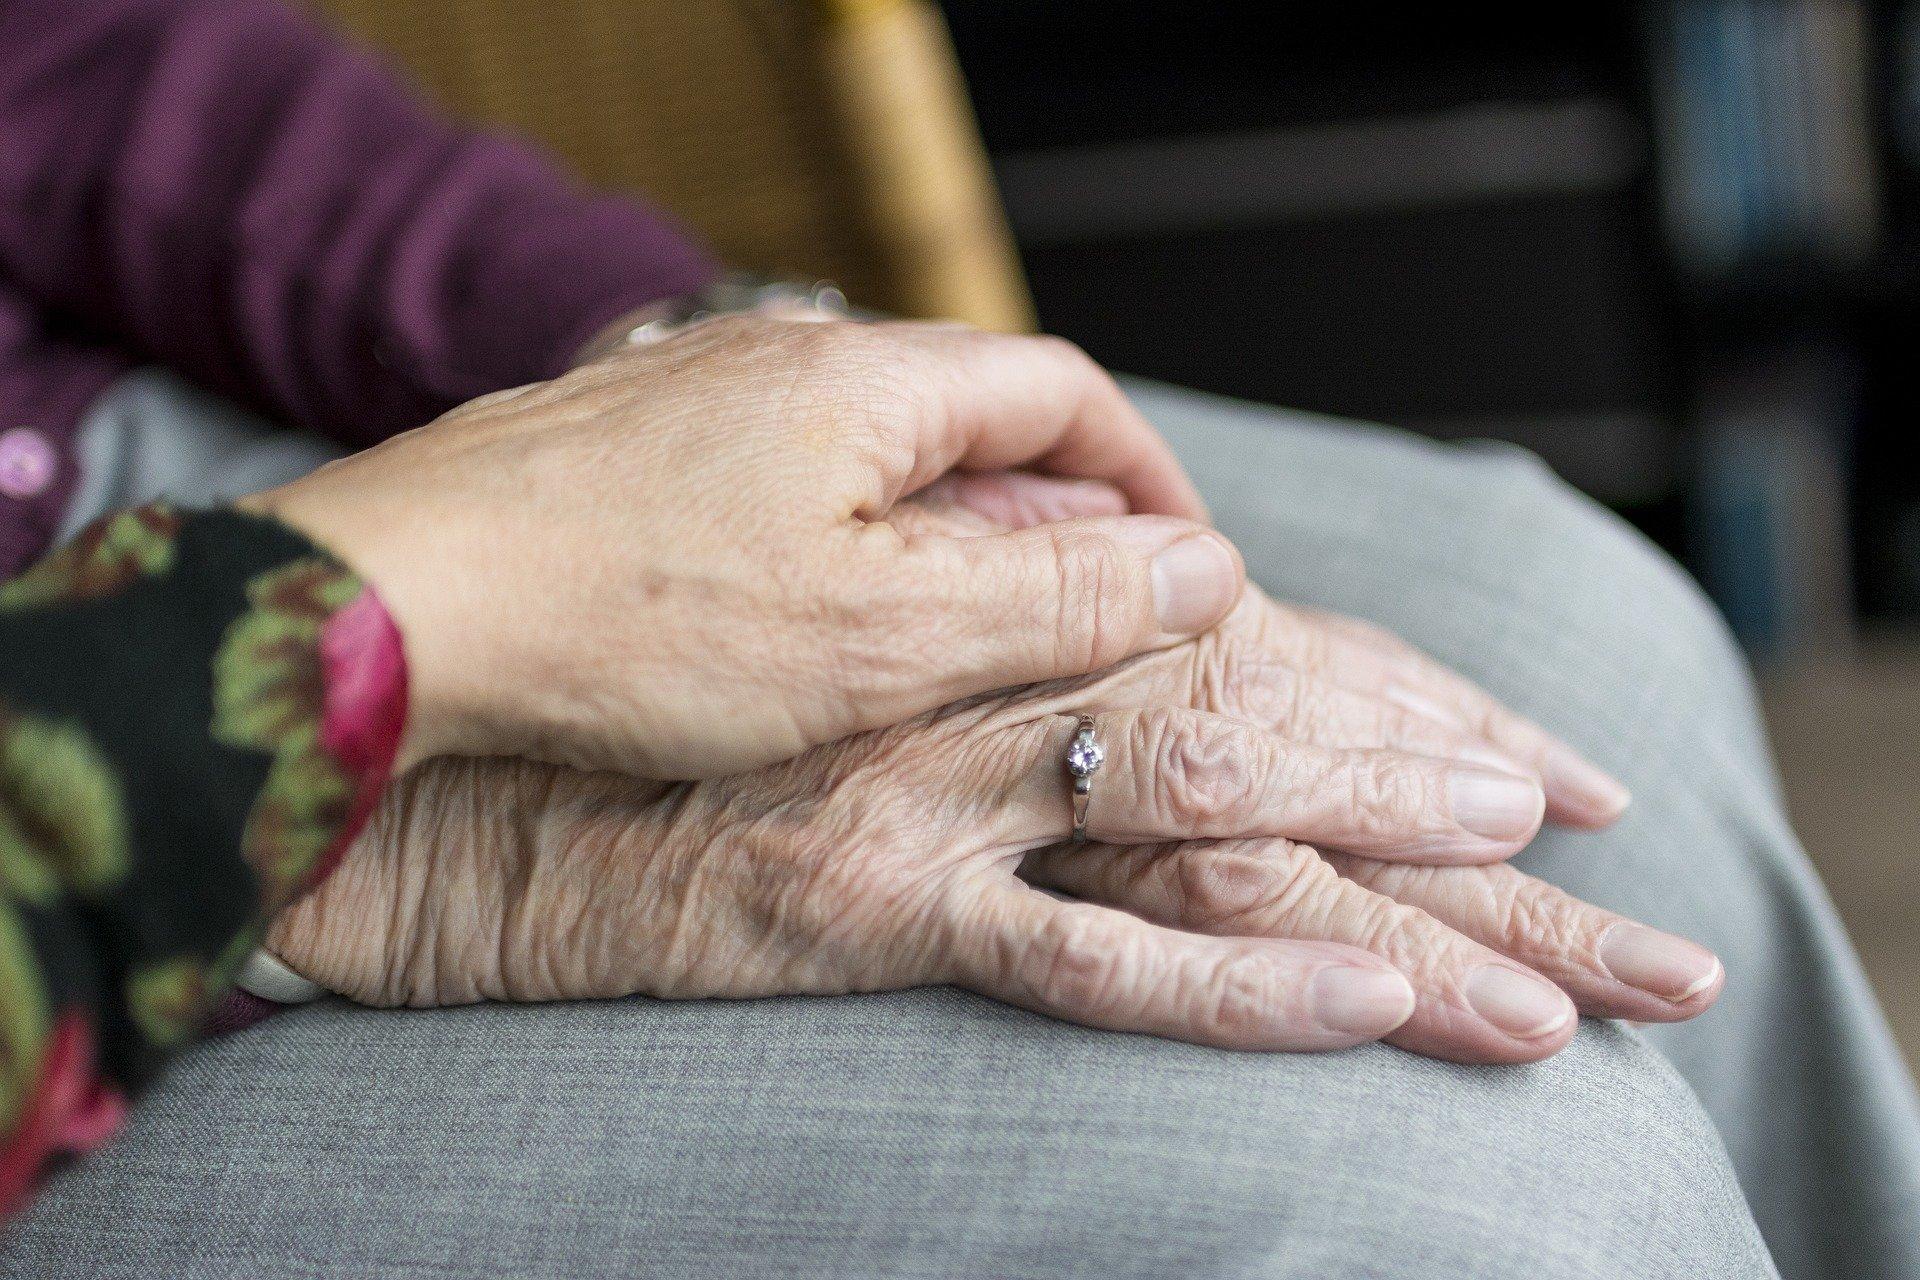 Pflege im Alter / Pixabay